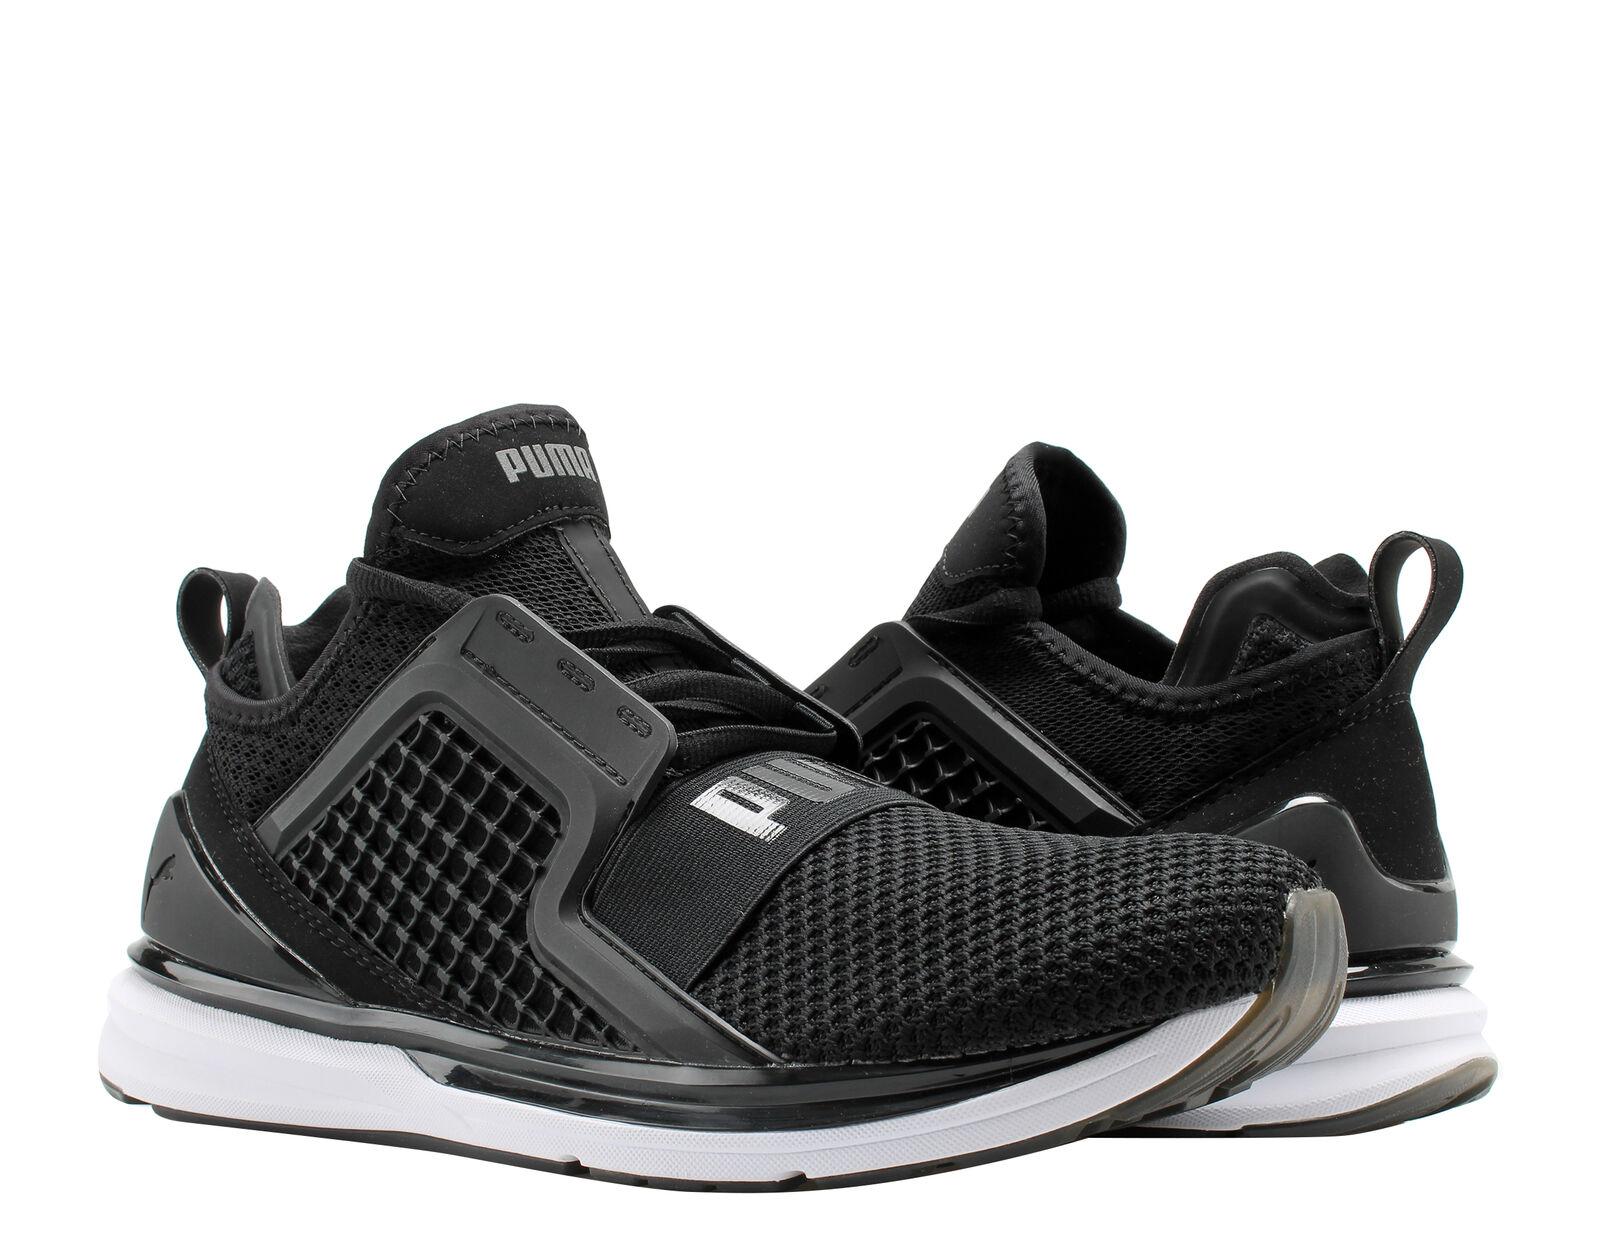 newest e4eb5 841ea Puma IGNITE Limitless Weave Puma Black/White Men's Running Shoes 19050302